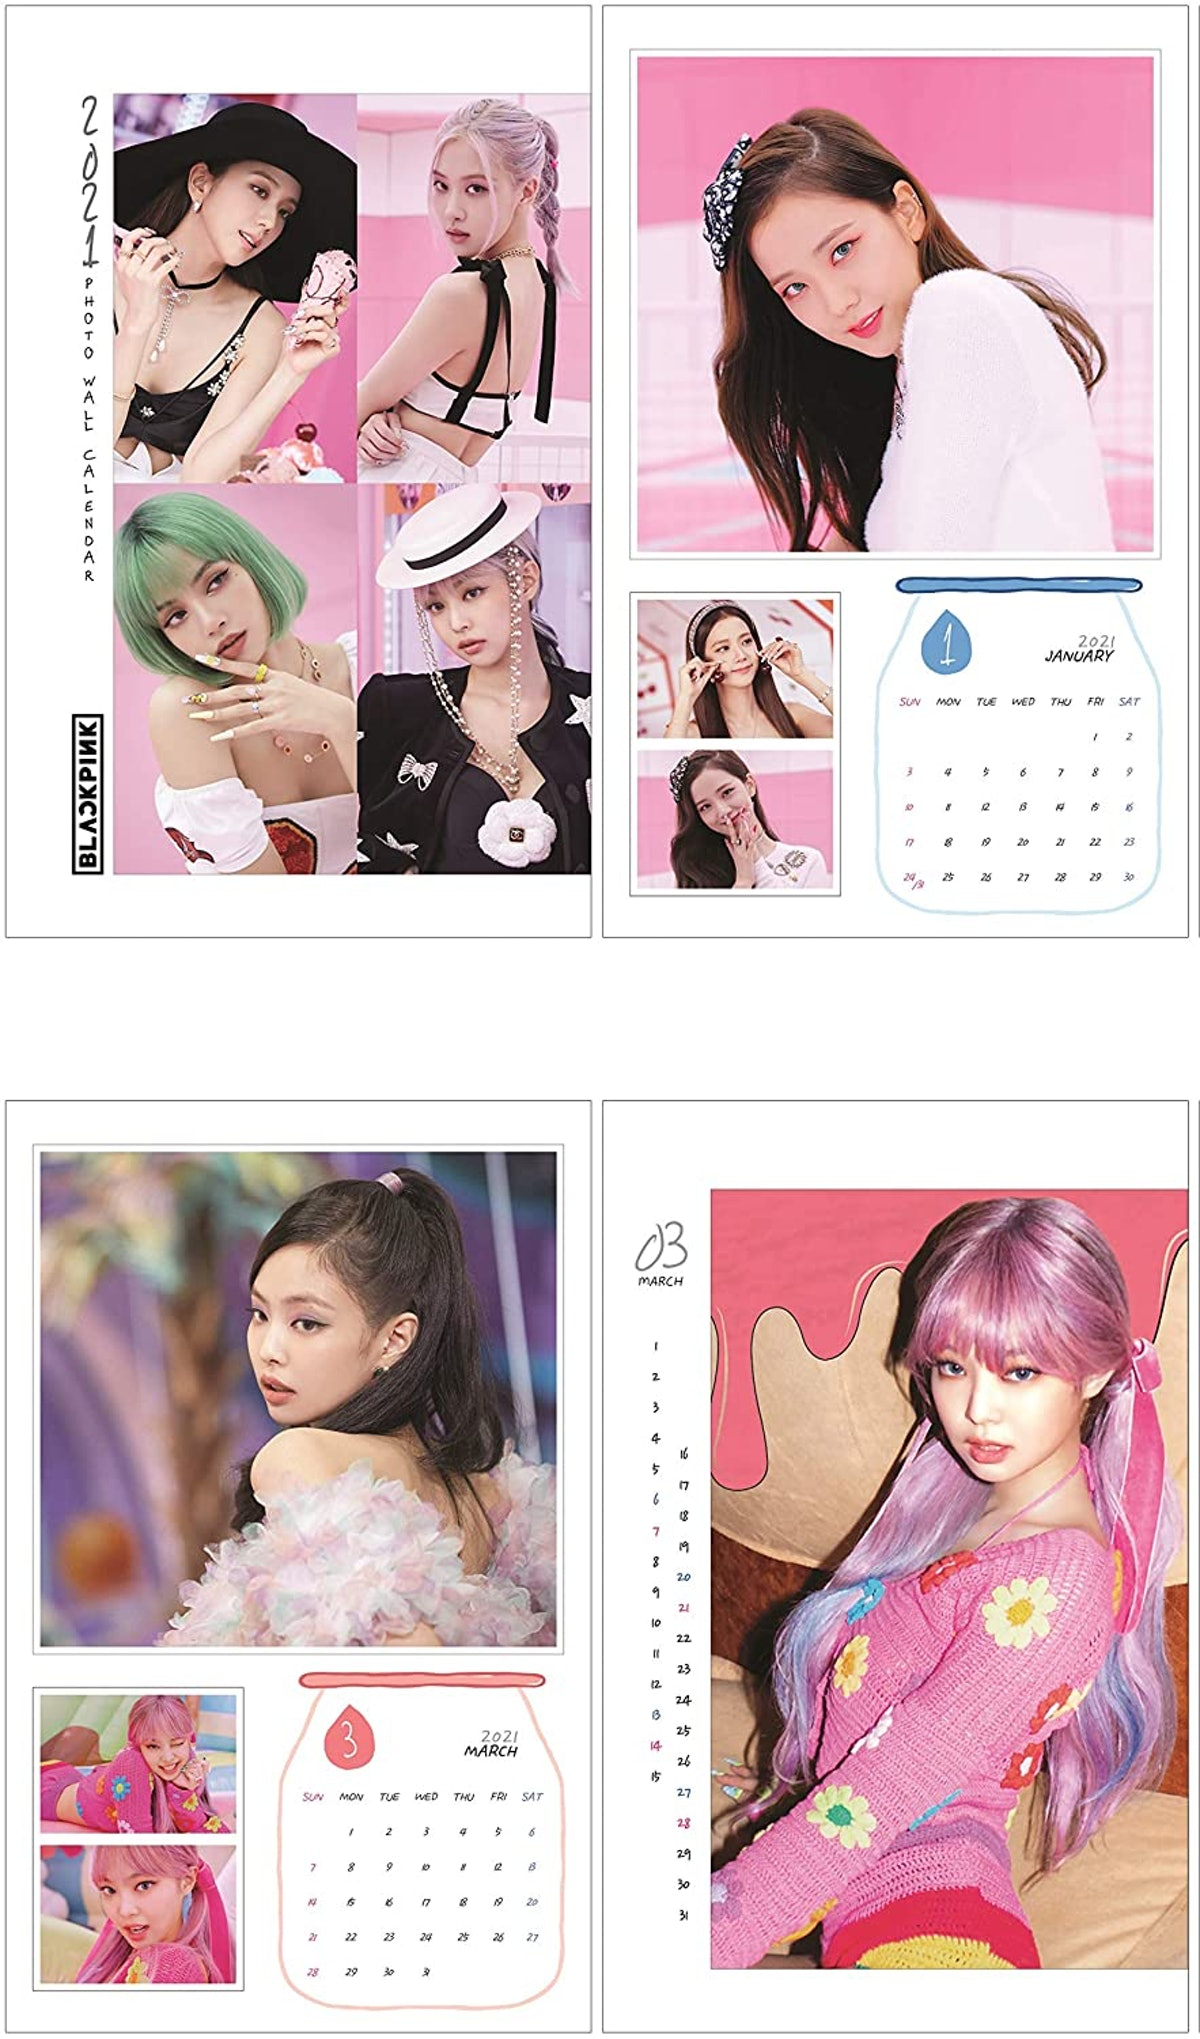 BLACKPINK 2021 New Wall Calendar + IDOLPARK Gift (Special Blackpink Photocards set)